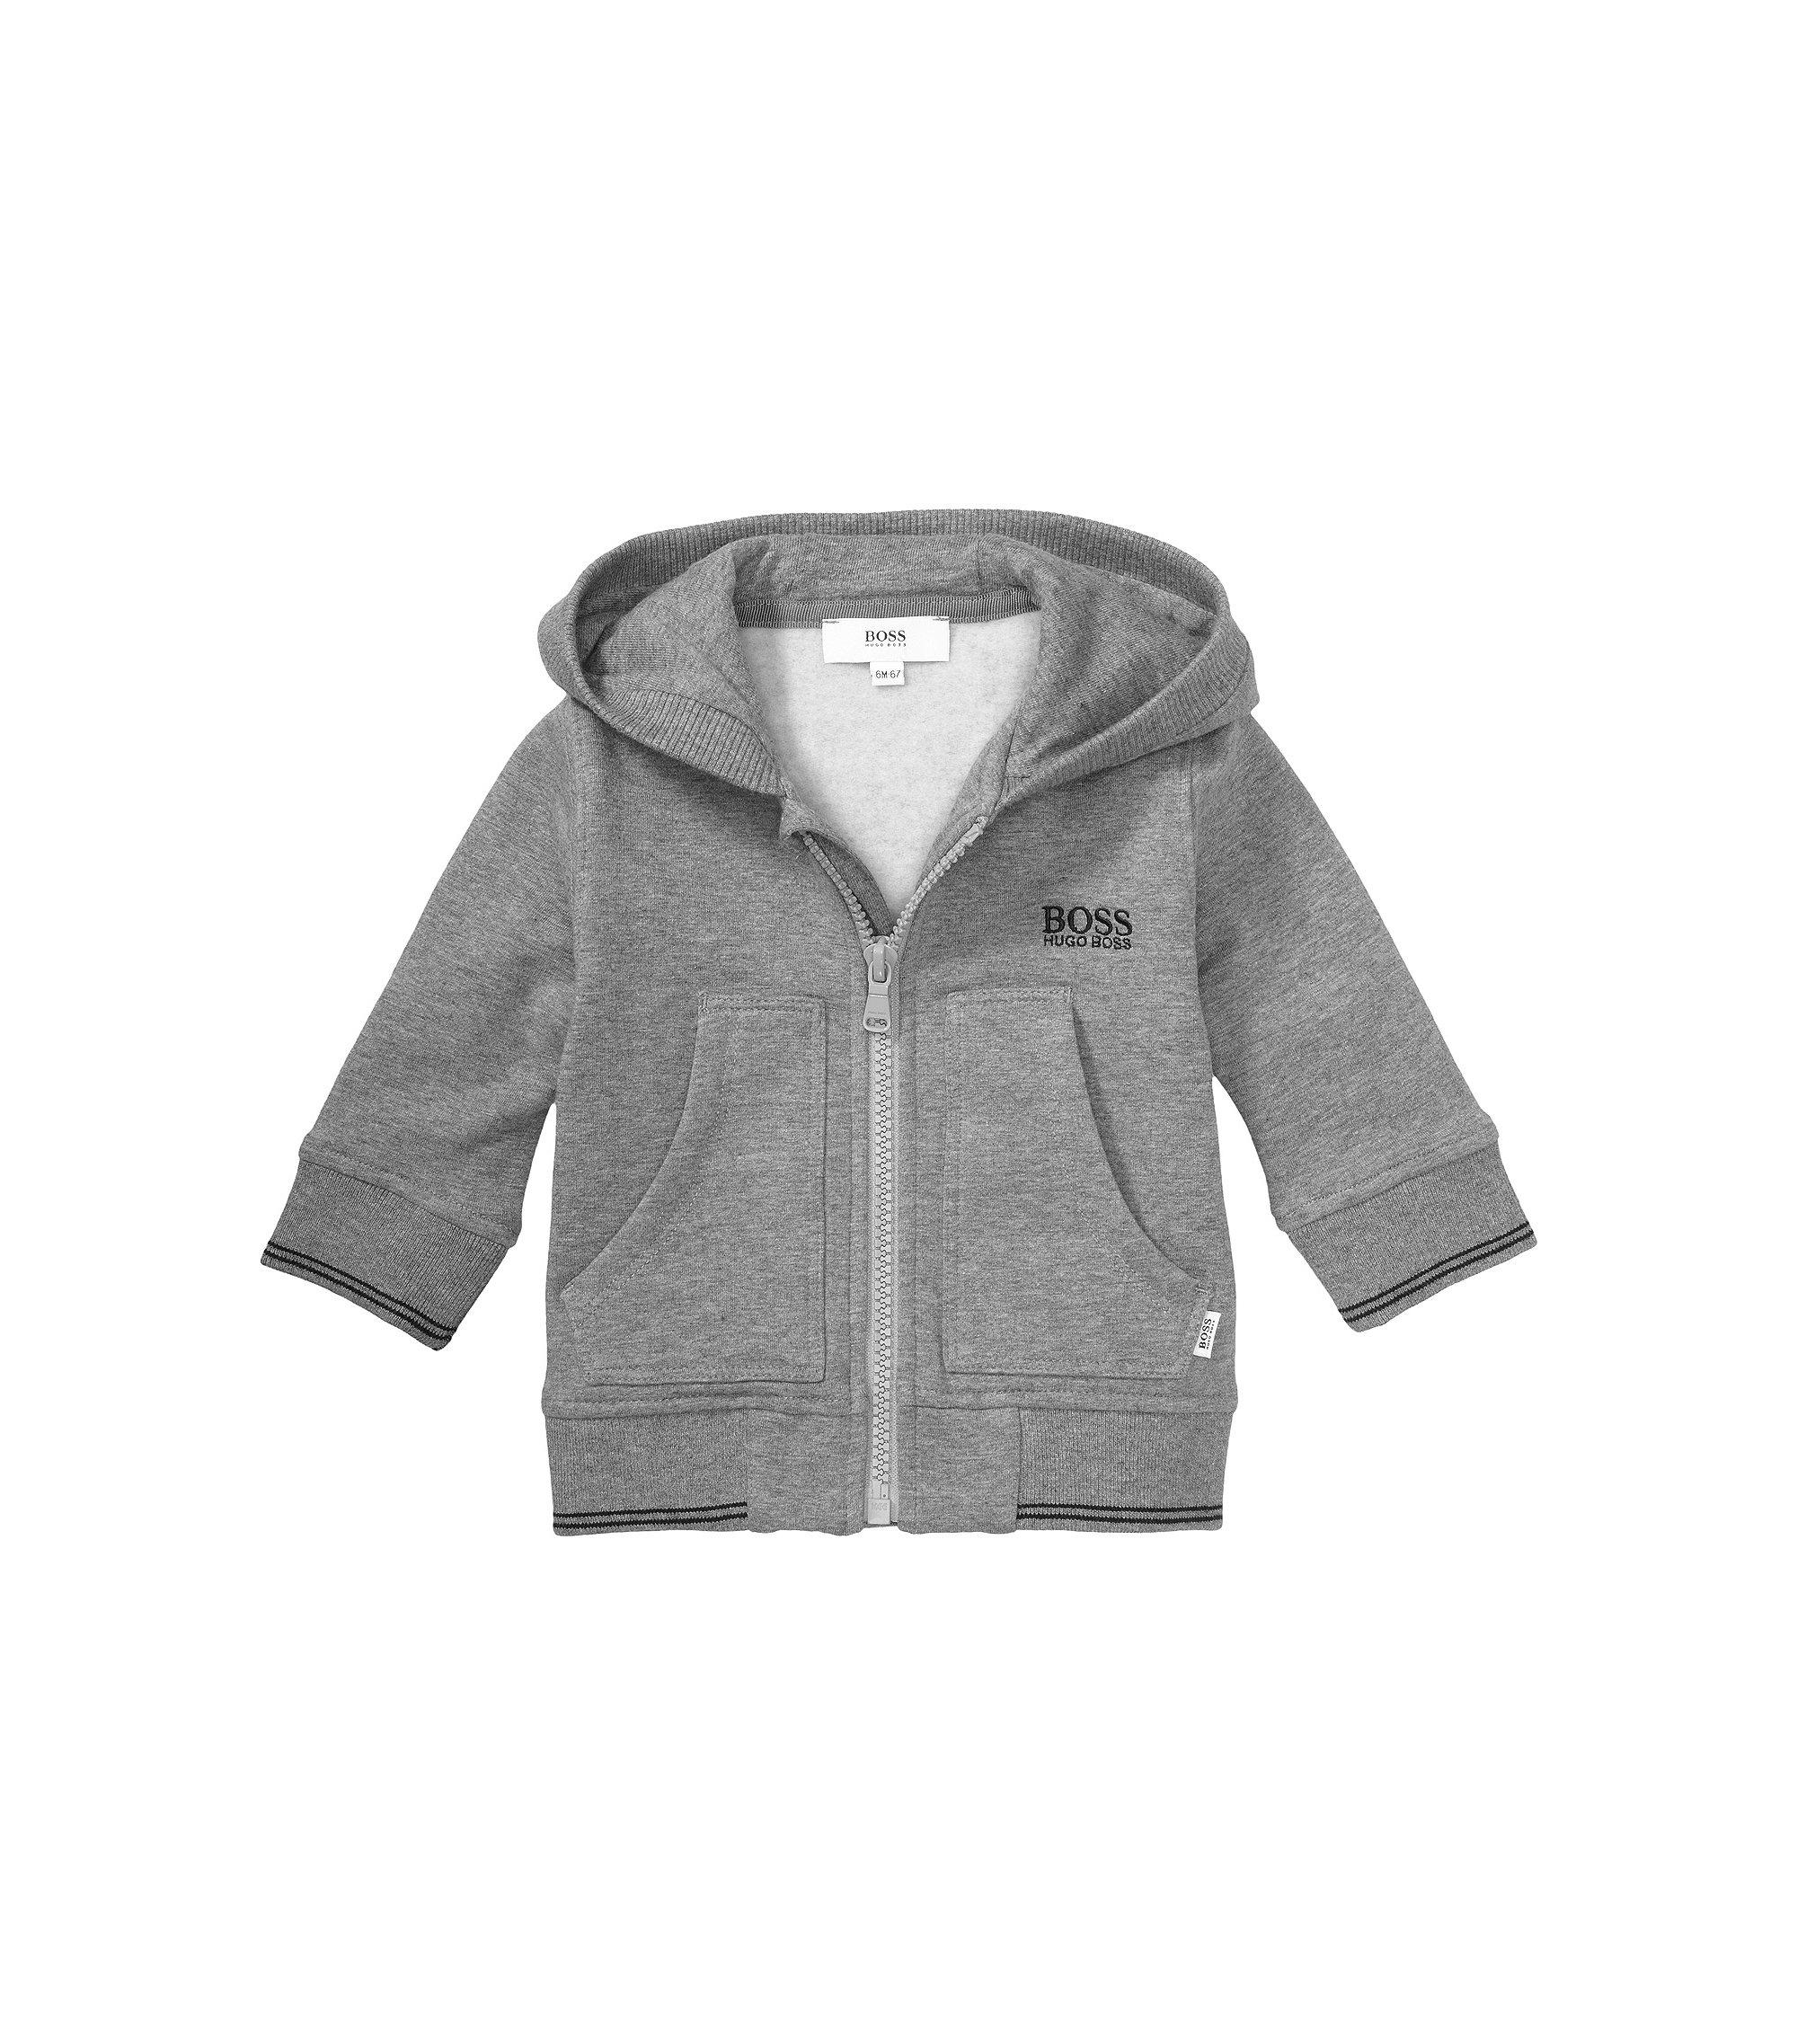 Kids-Sweatshirt-Jacke ´J05323` aus Baumwoll-Mix, Dunkelgrau